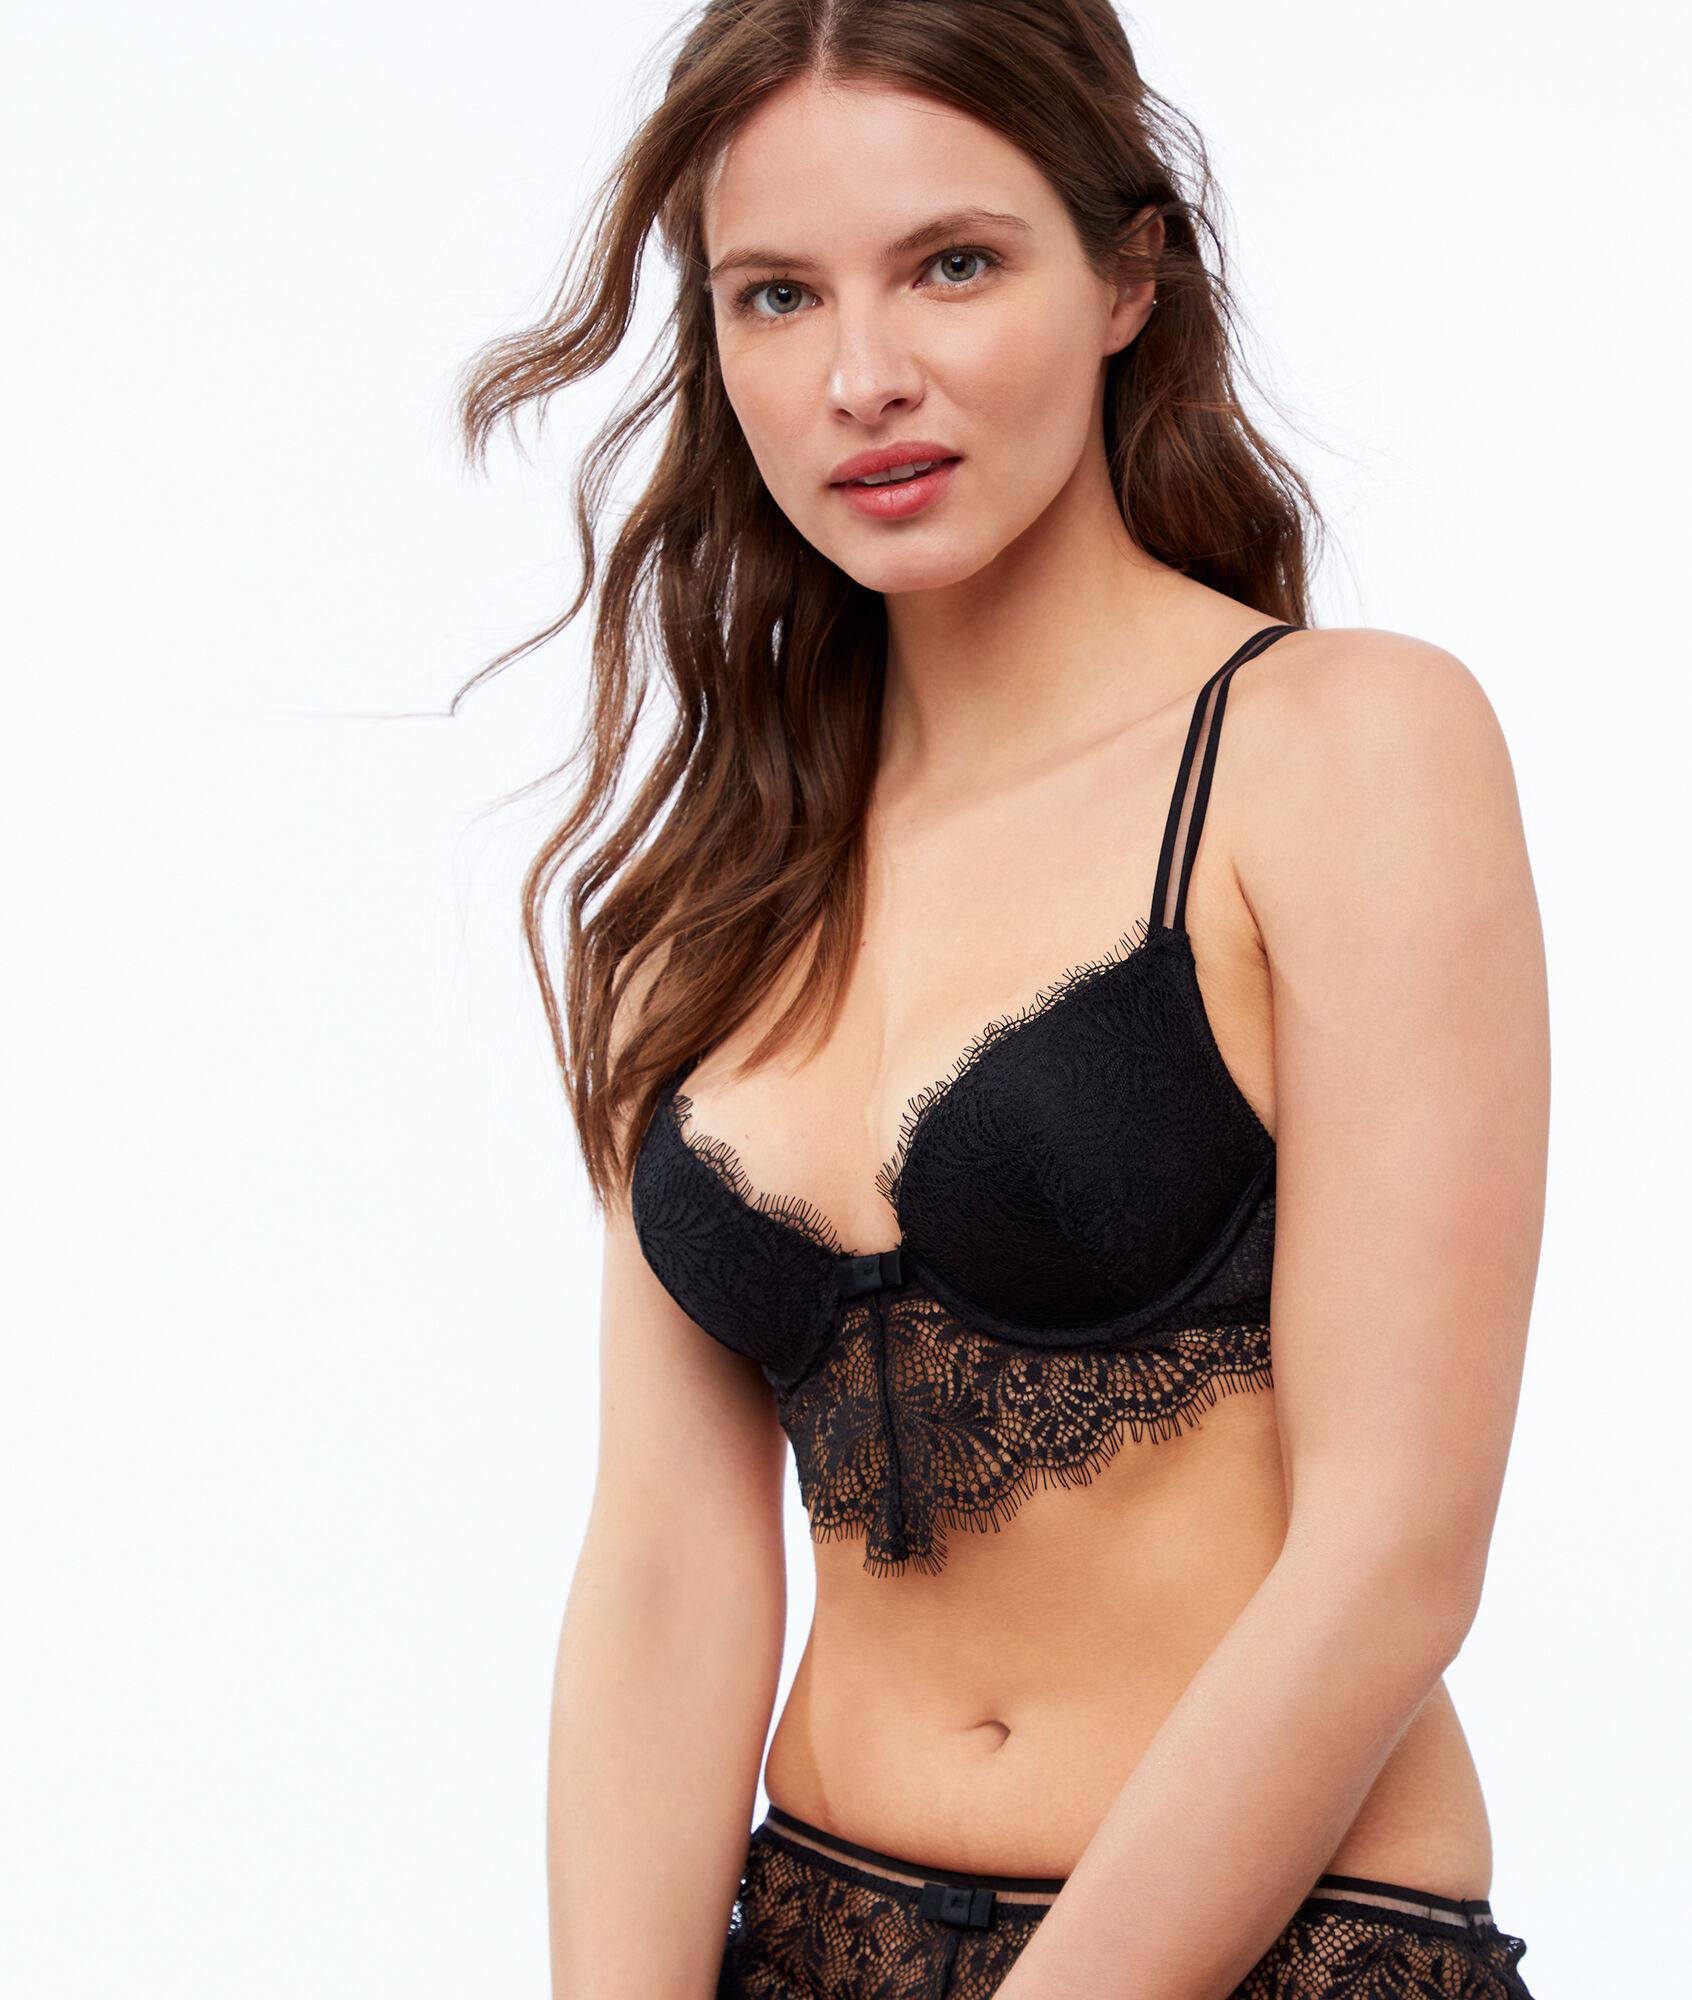 6d391165b87 Bra No. 2 - Lace plunging push-up bra with decorative underband - Etam